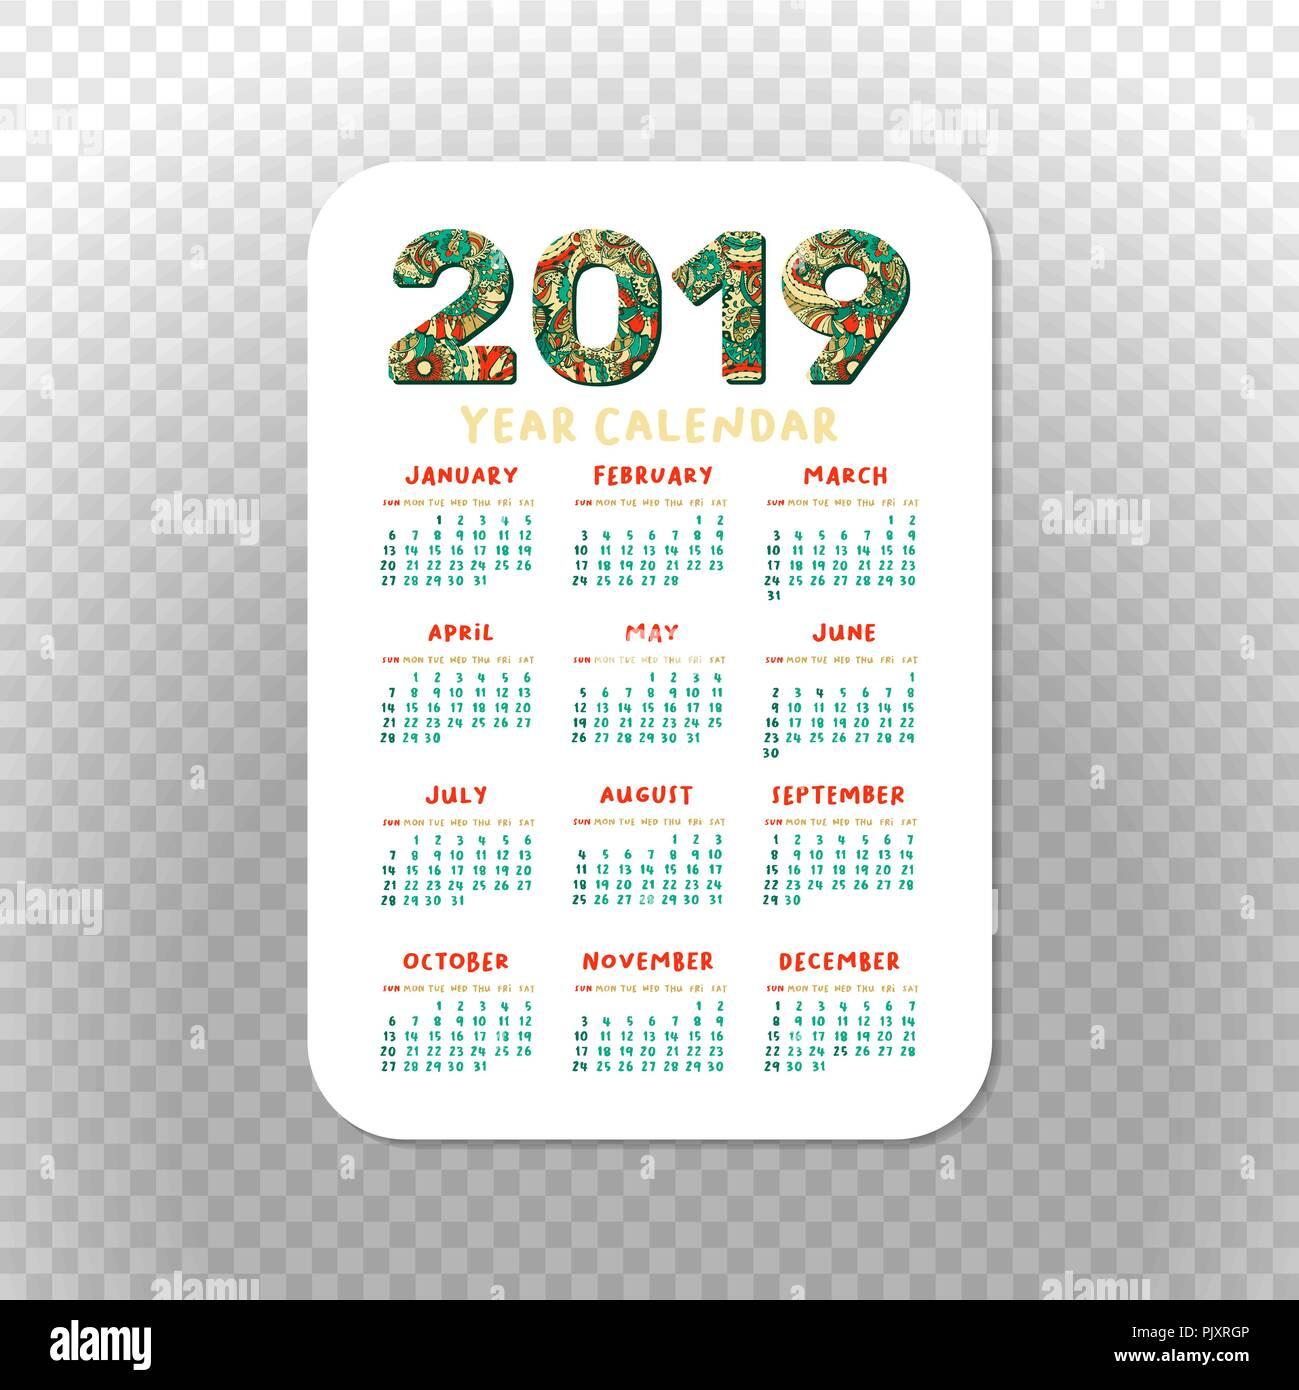 Calendario 2019 Con Numero Week.2019 Pocket Calendar Basic Grid Vector Vertical Orientation